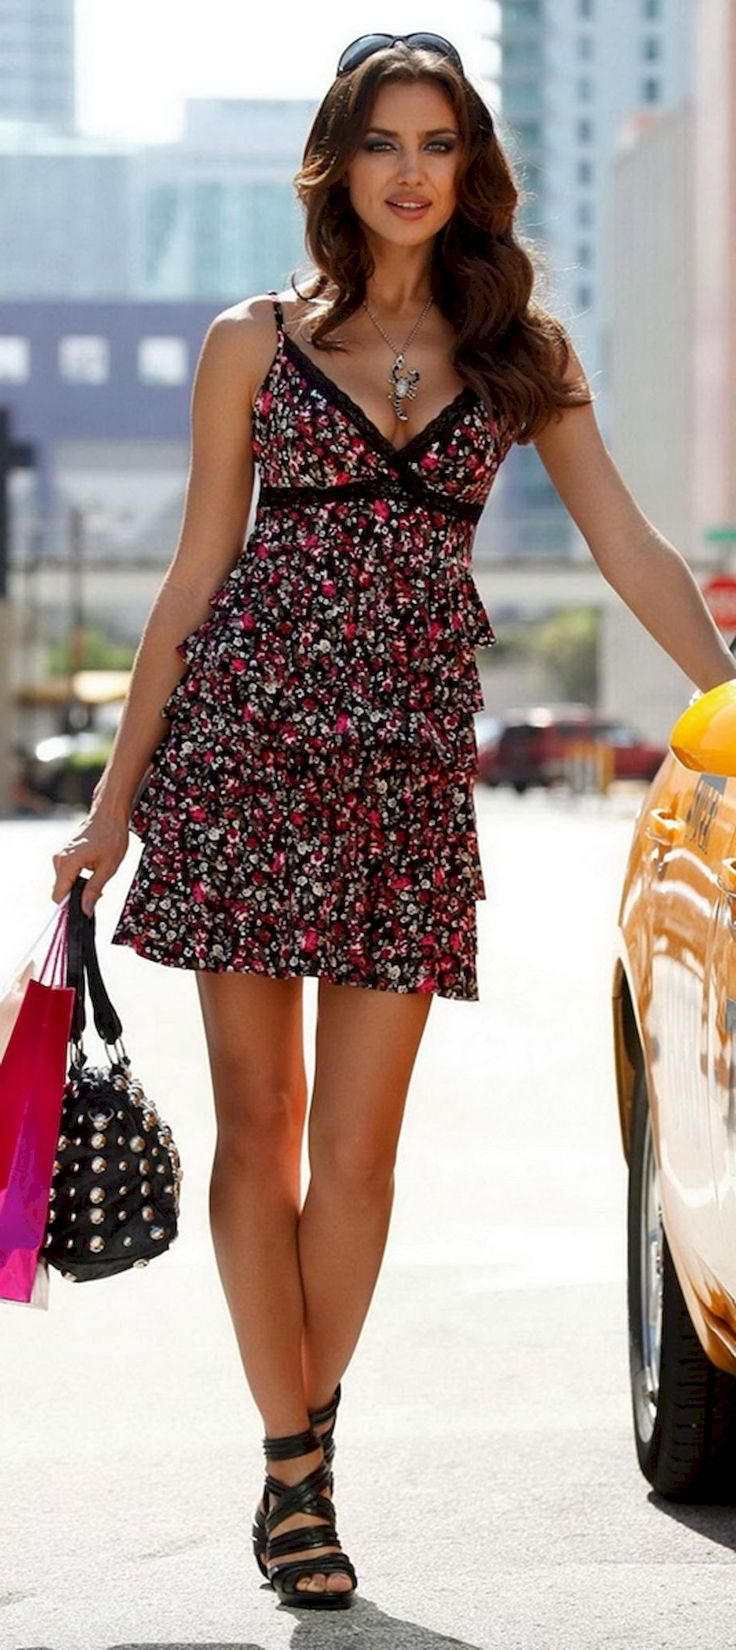 Wonderful Irina Shayk Street Styles (116 Photos) https://www.fashionvevo.com/irina-shayk/